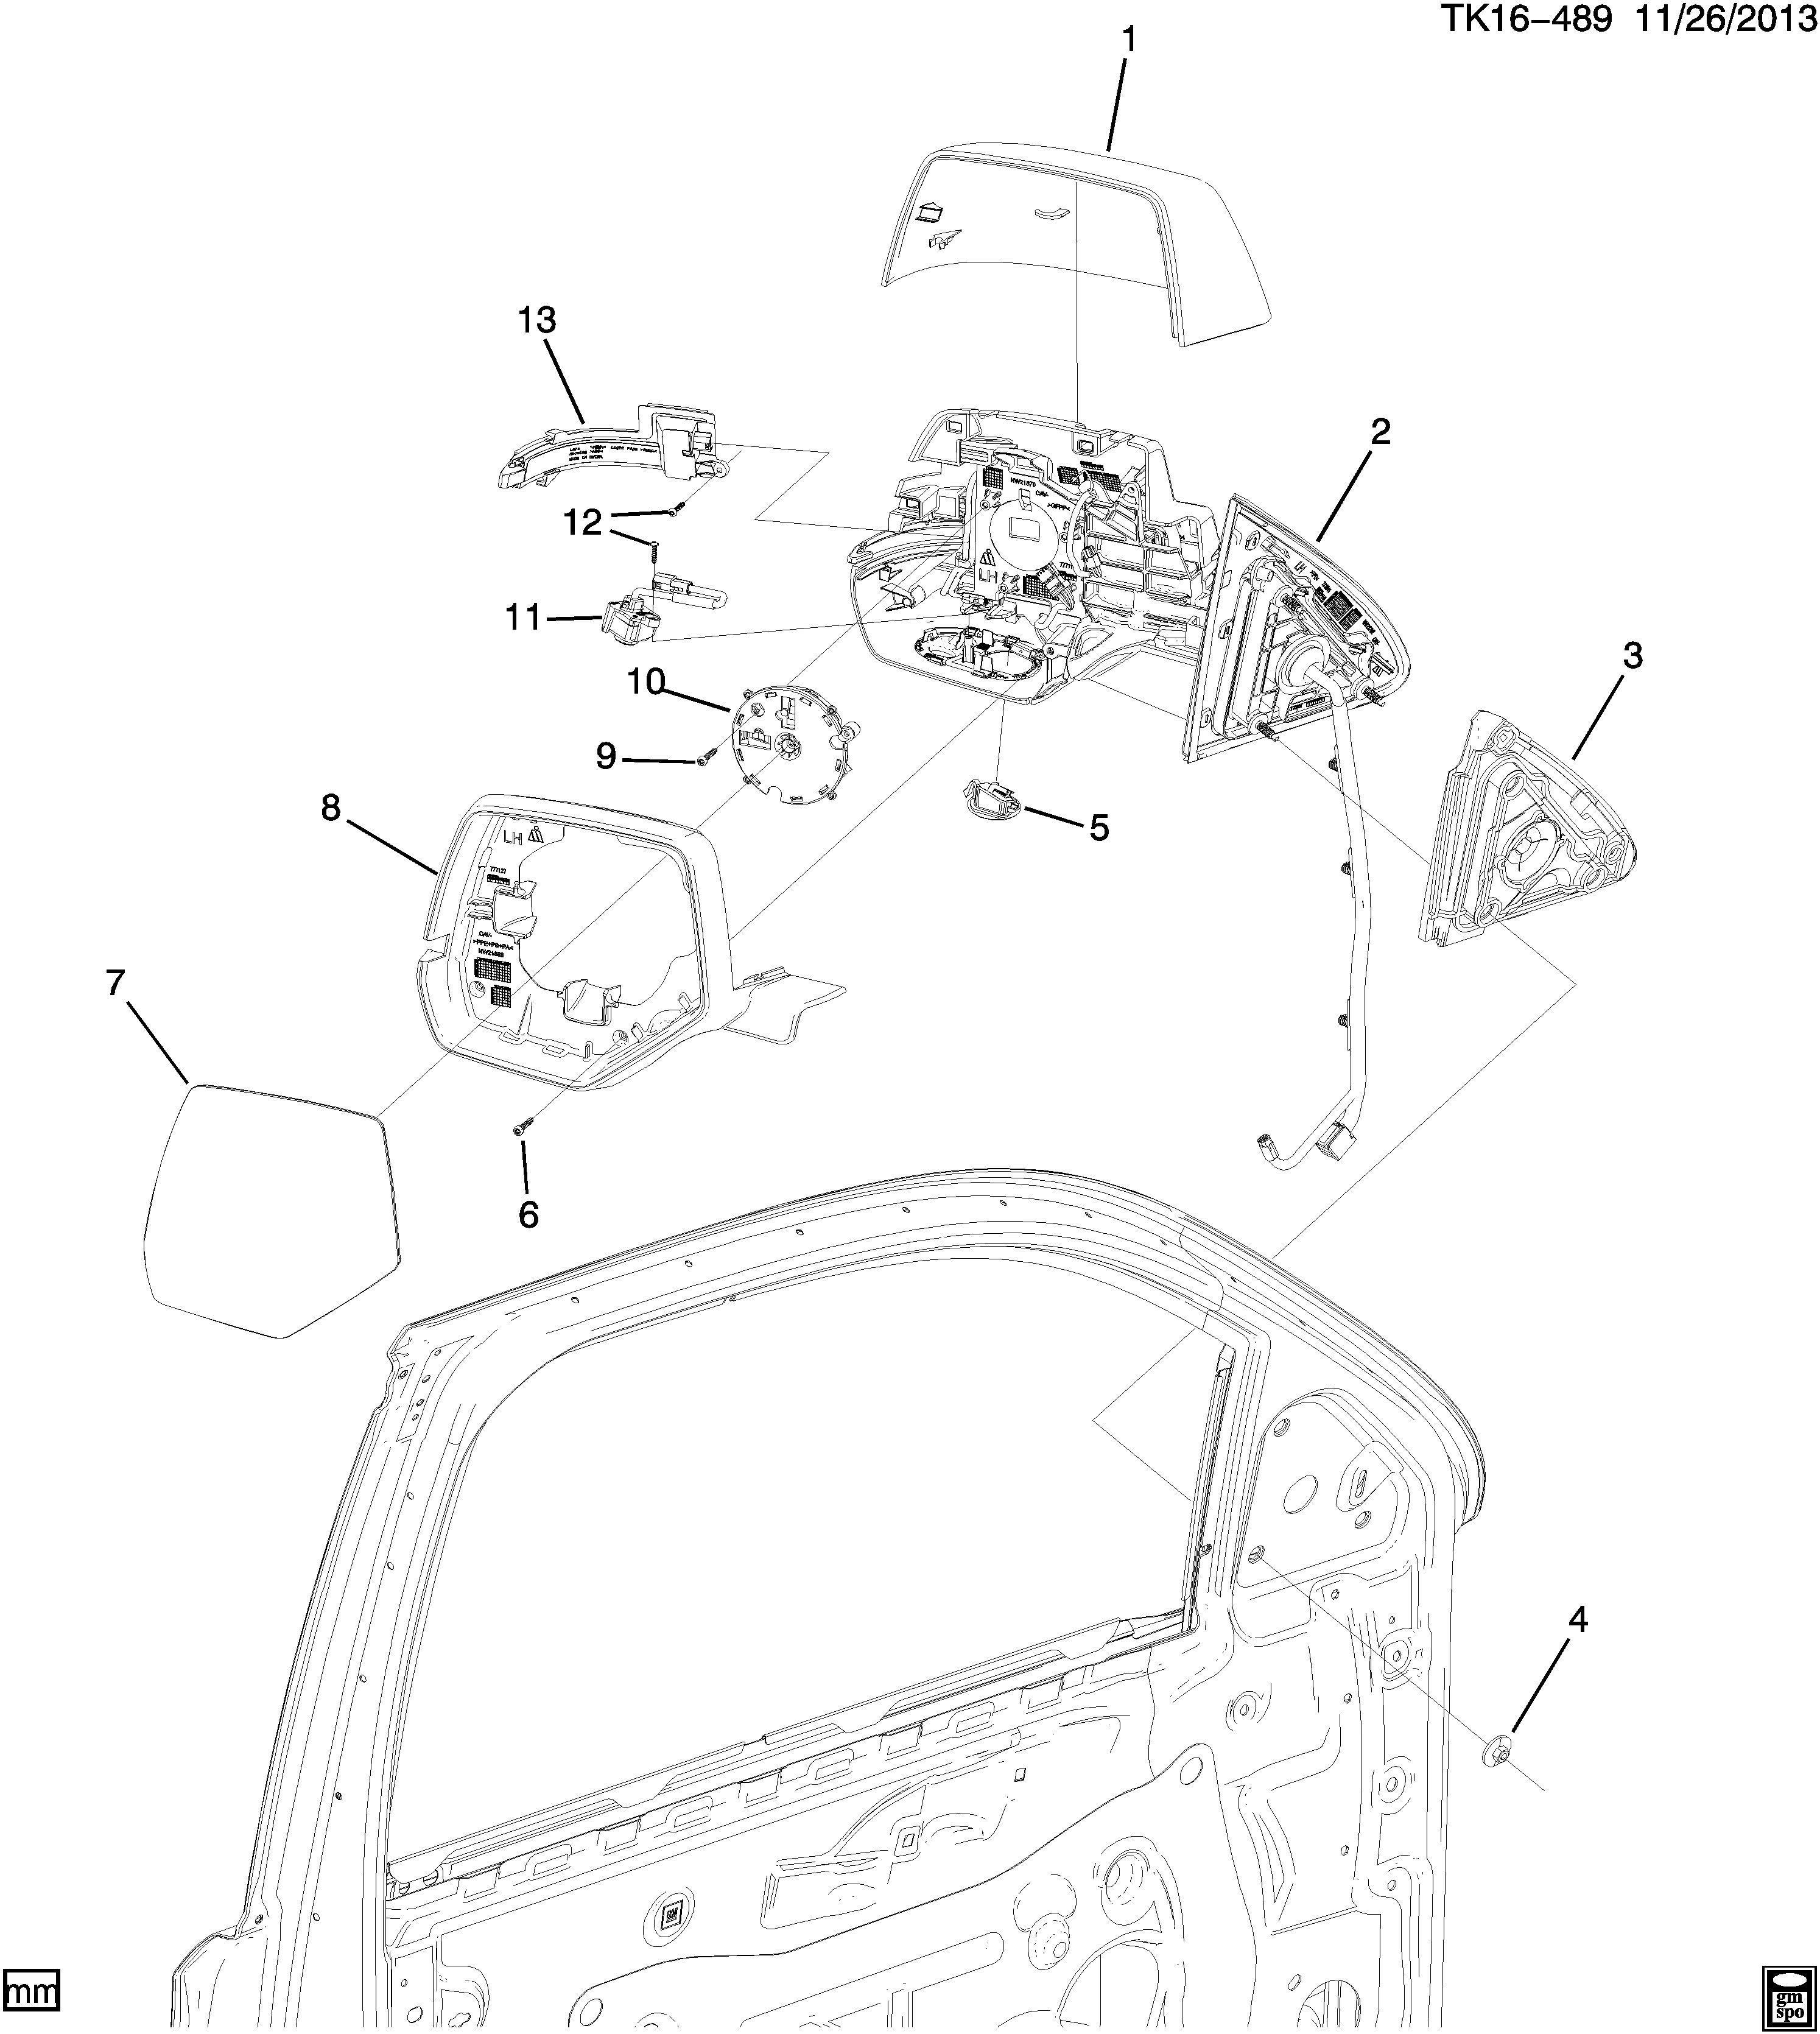 Chevrolet Tahoe Actuator. Rear view mirror. Actuator, o/s